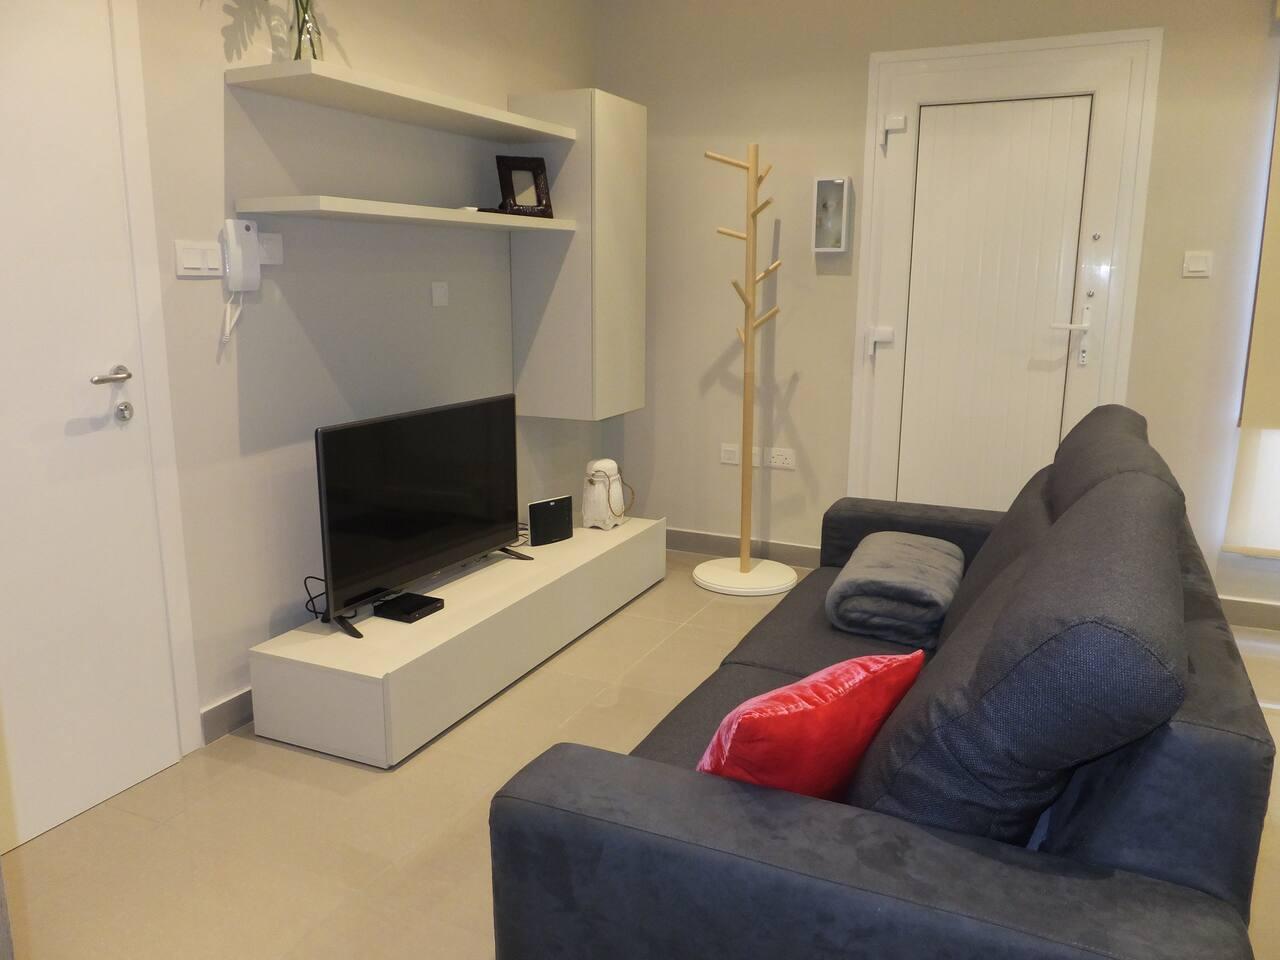 malta accommodation prices